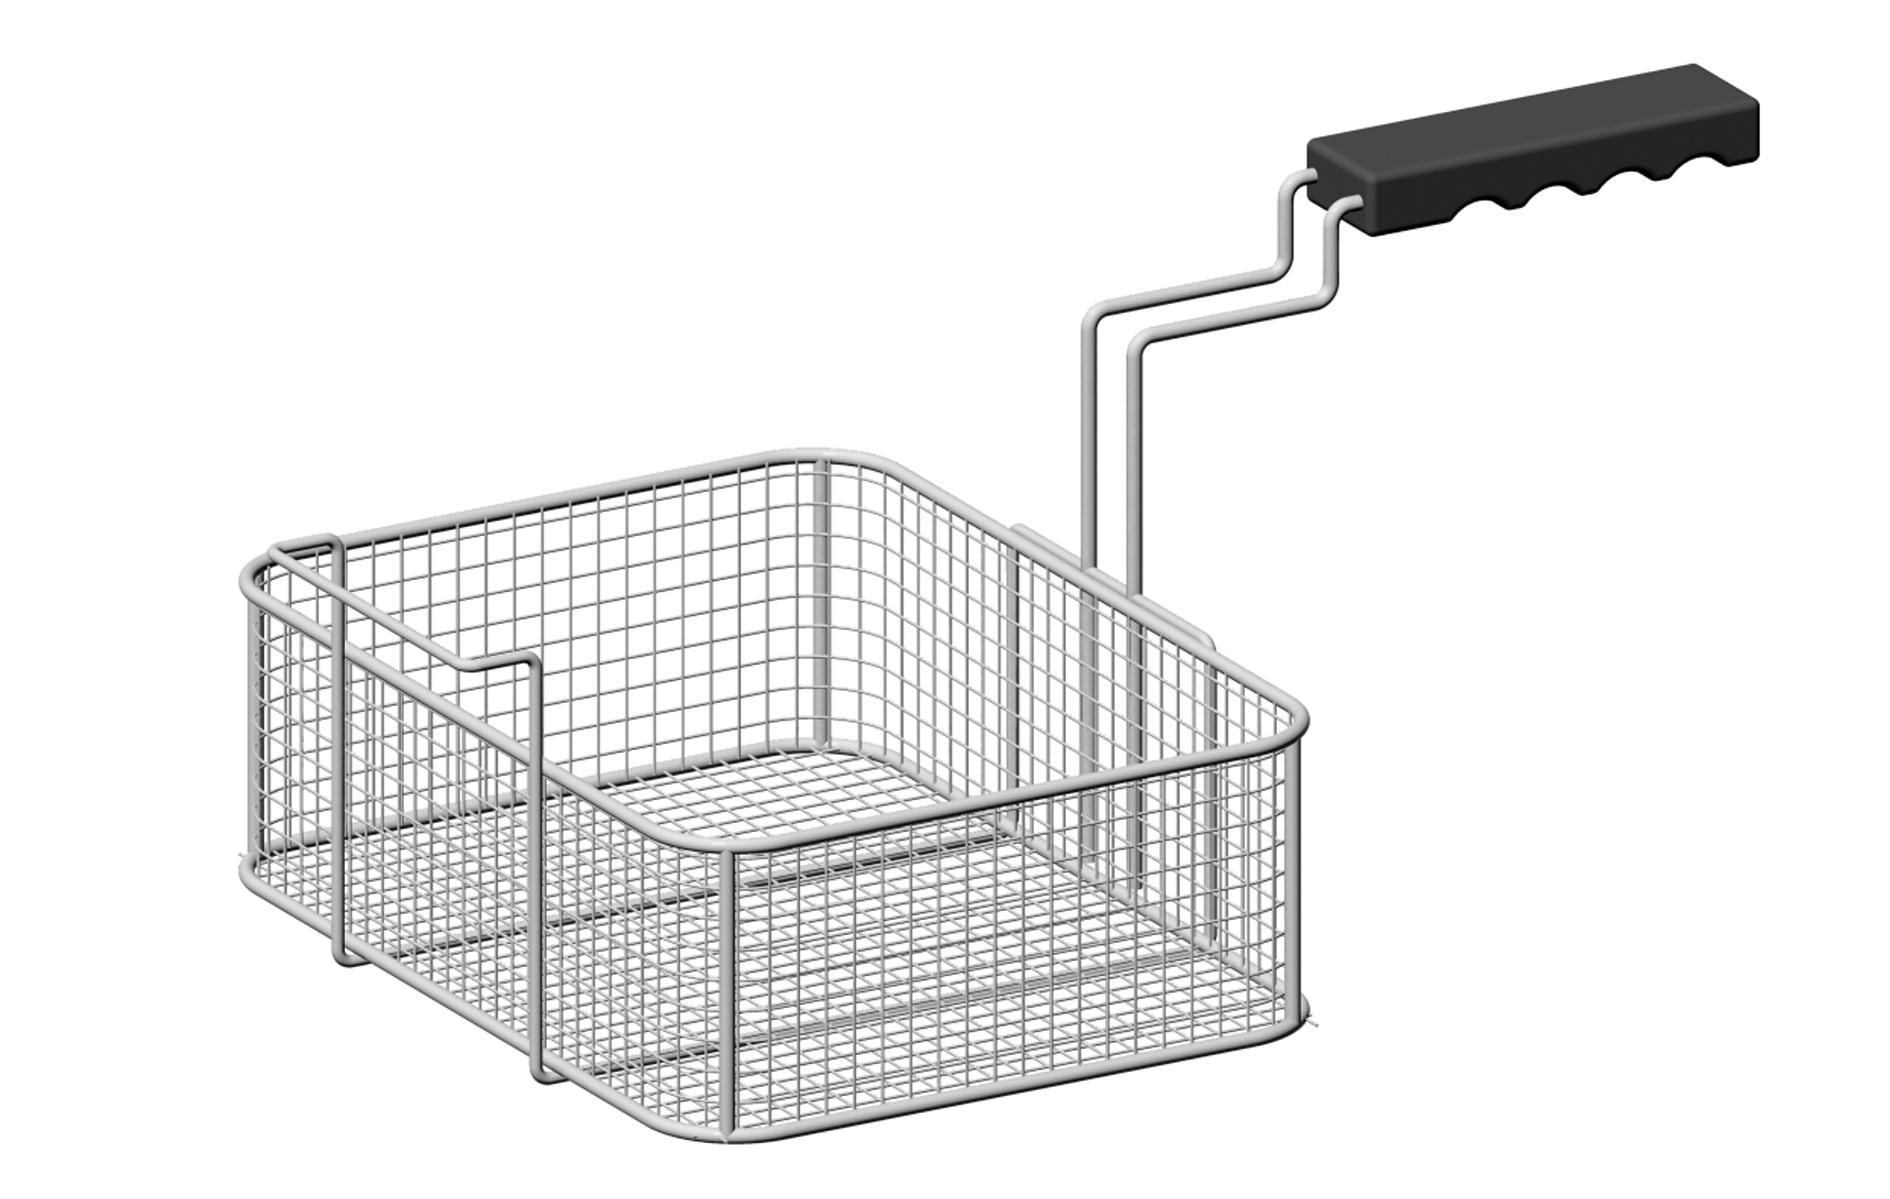 Eurast 63940000 Fryer basket 12 lts. for fryer group 450 bar - 306x232x100 mm